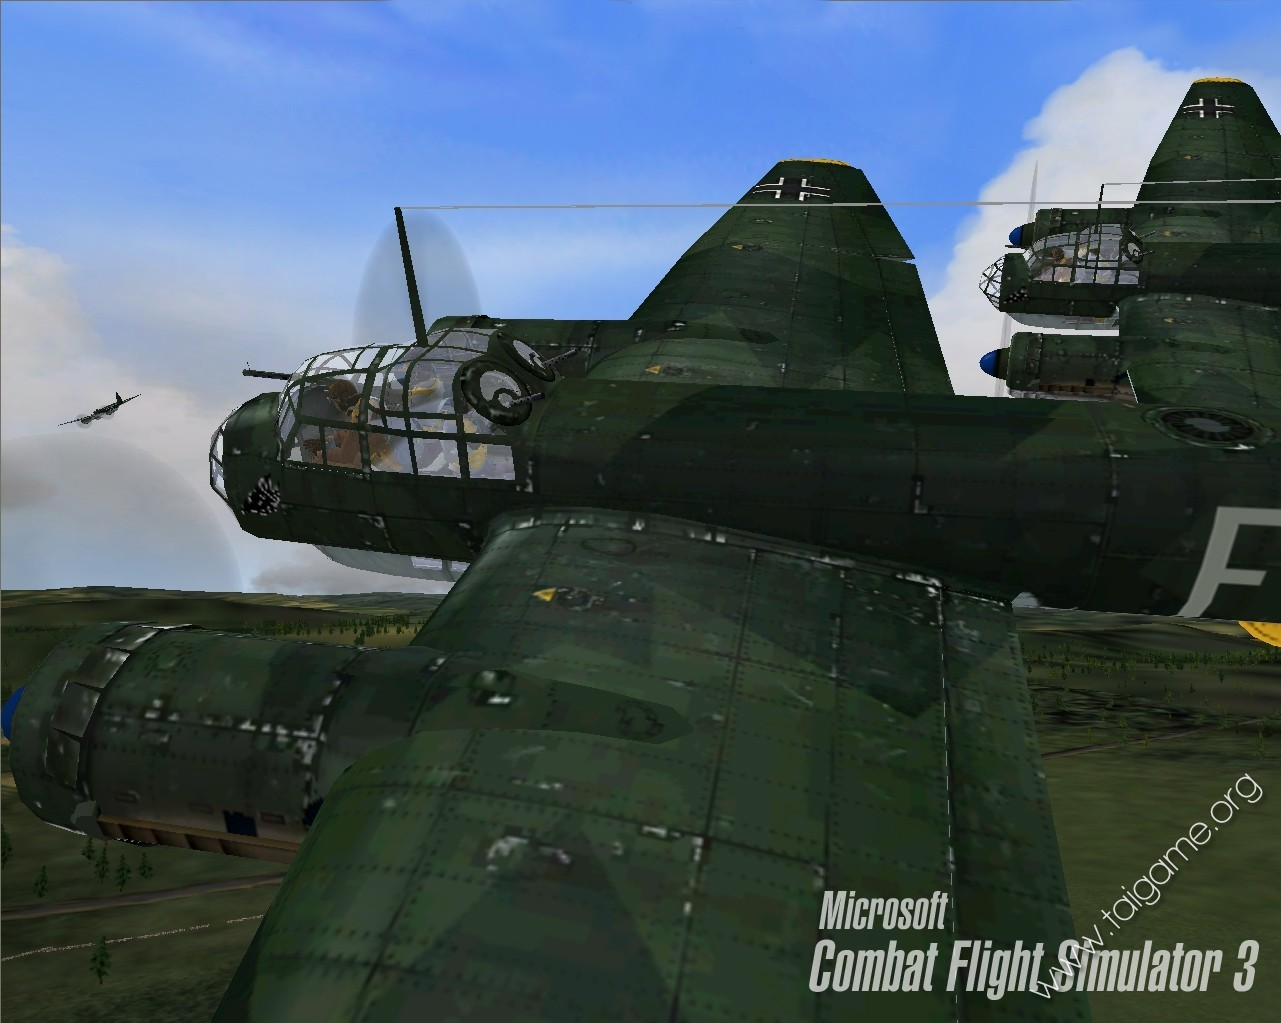 Combat flight simulator 3: battle for europe democracy